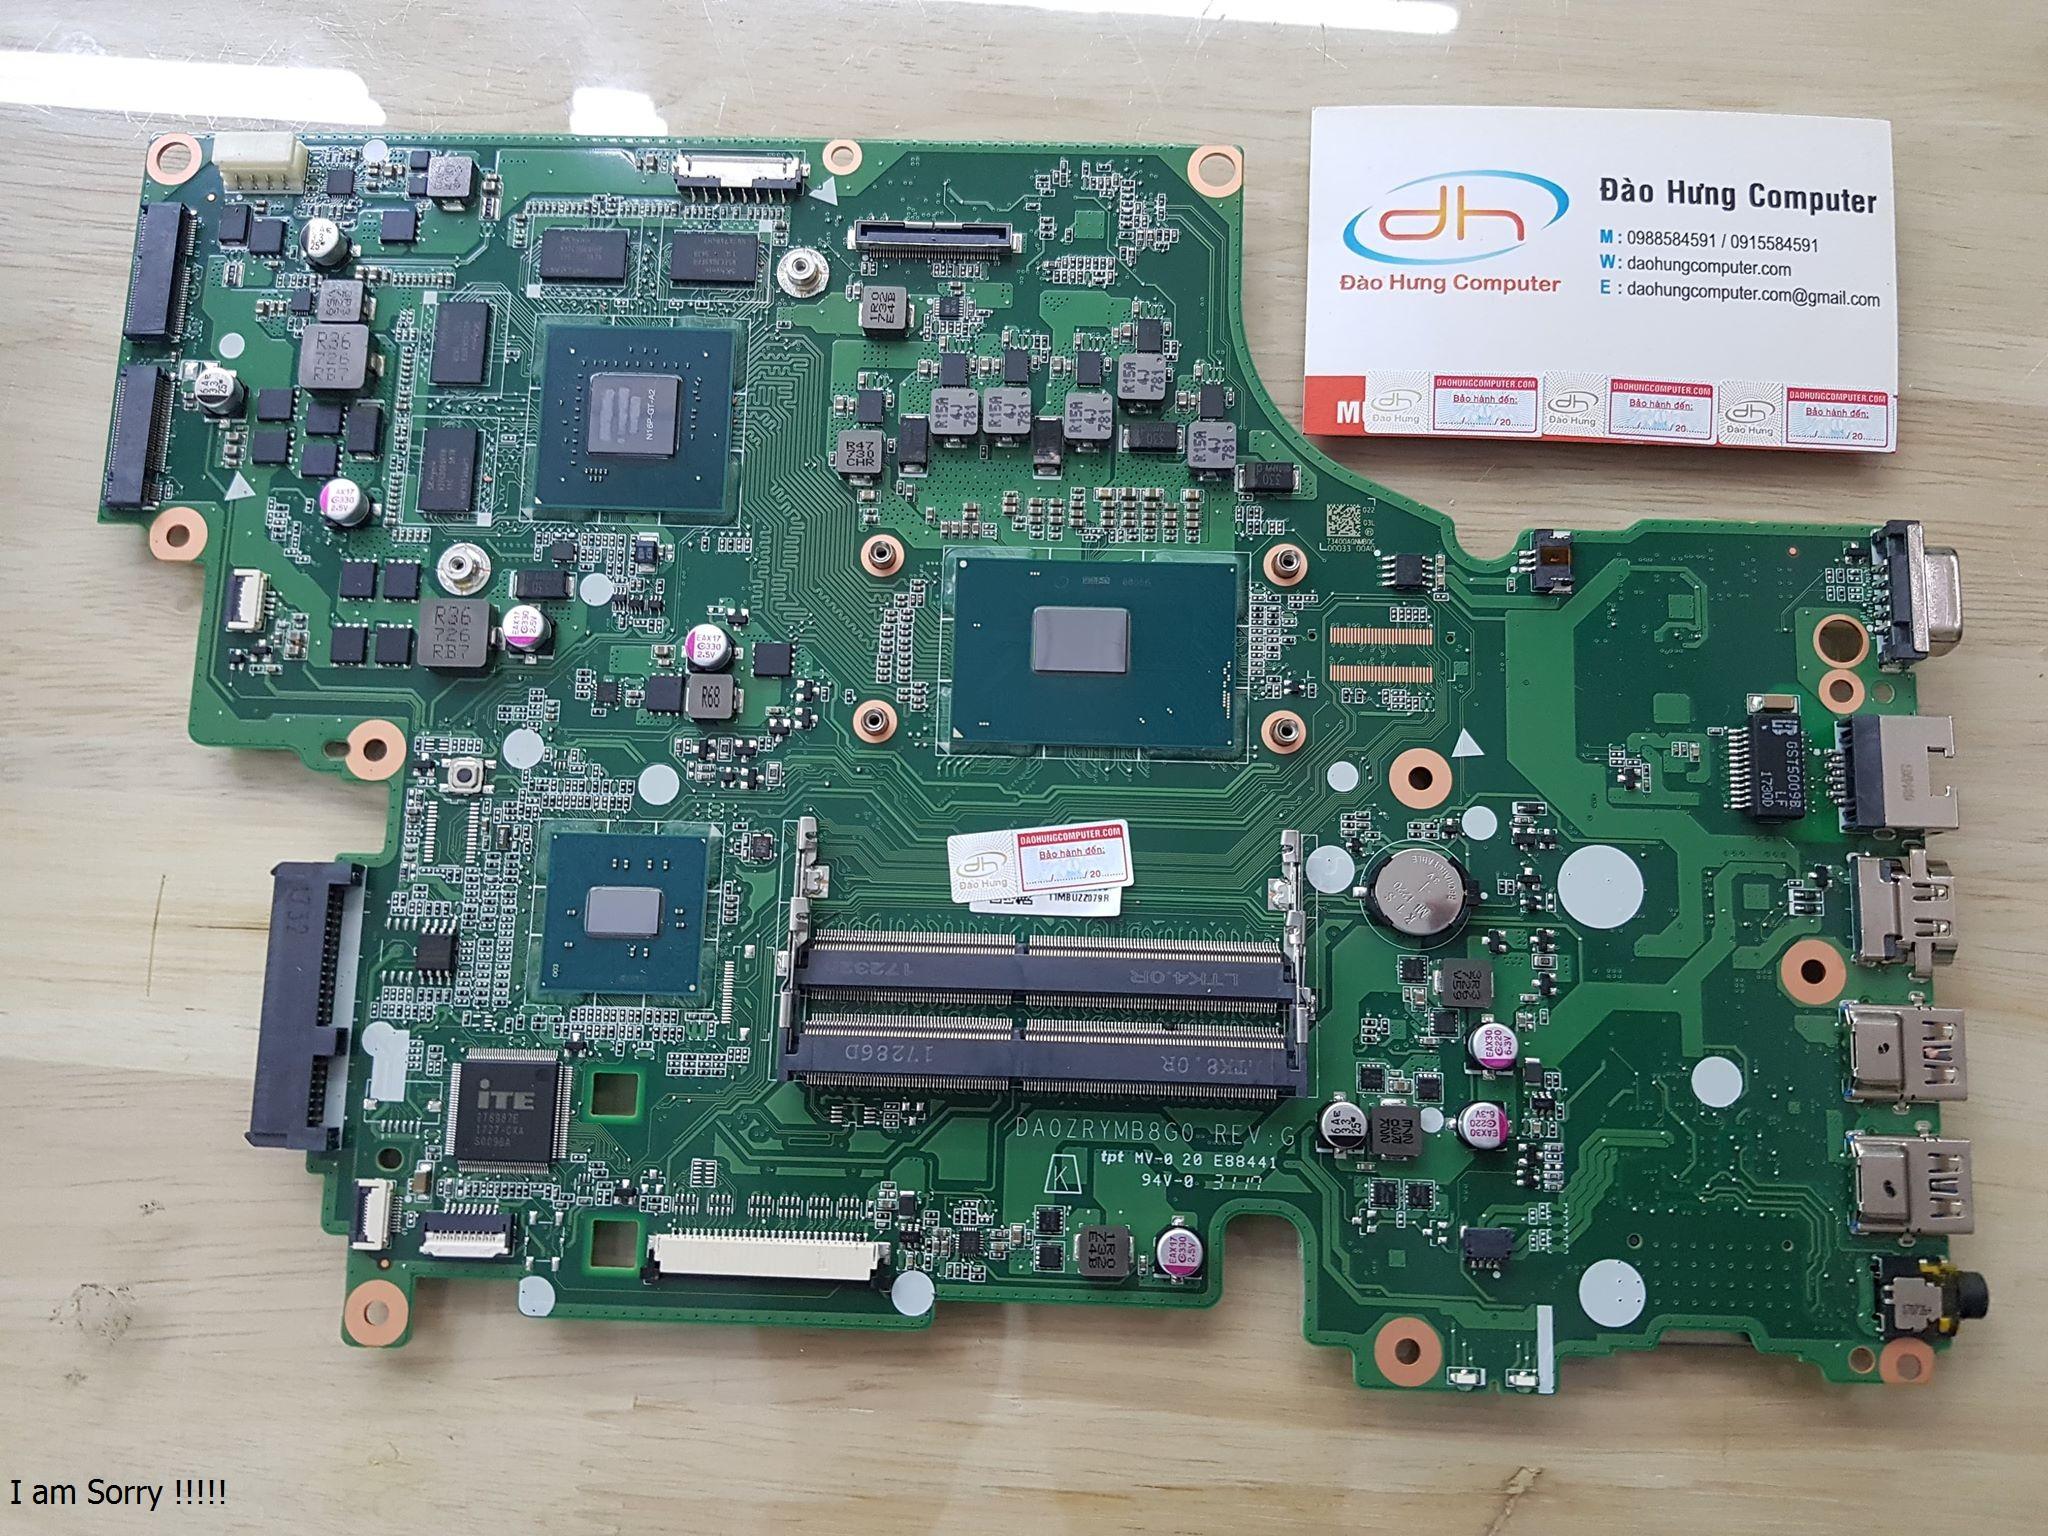 mainboard-acer-v5-591g-core-i5-6300hq-vga-gtx-950m-dazrymb8g00